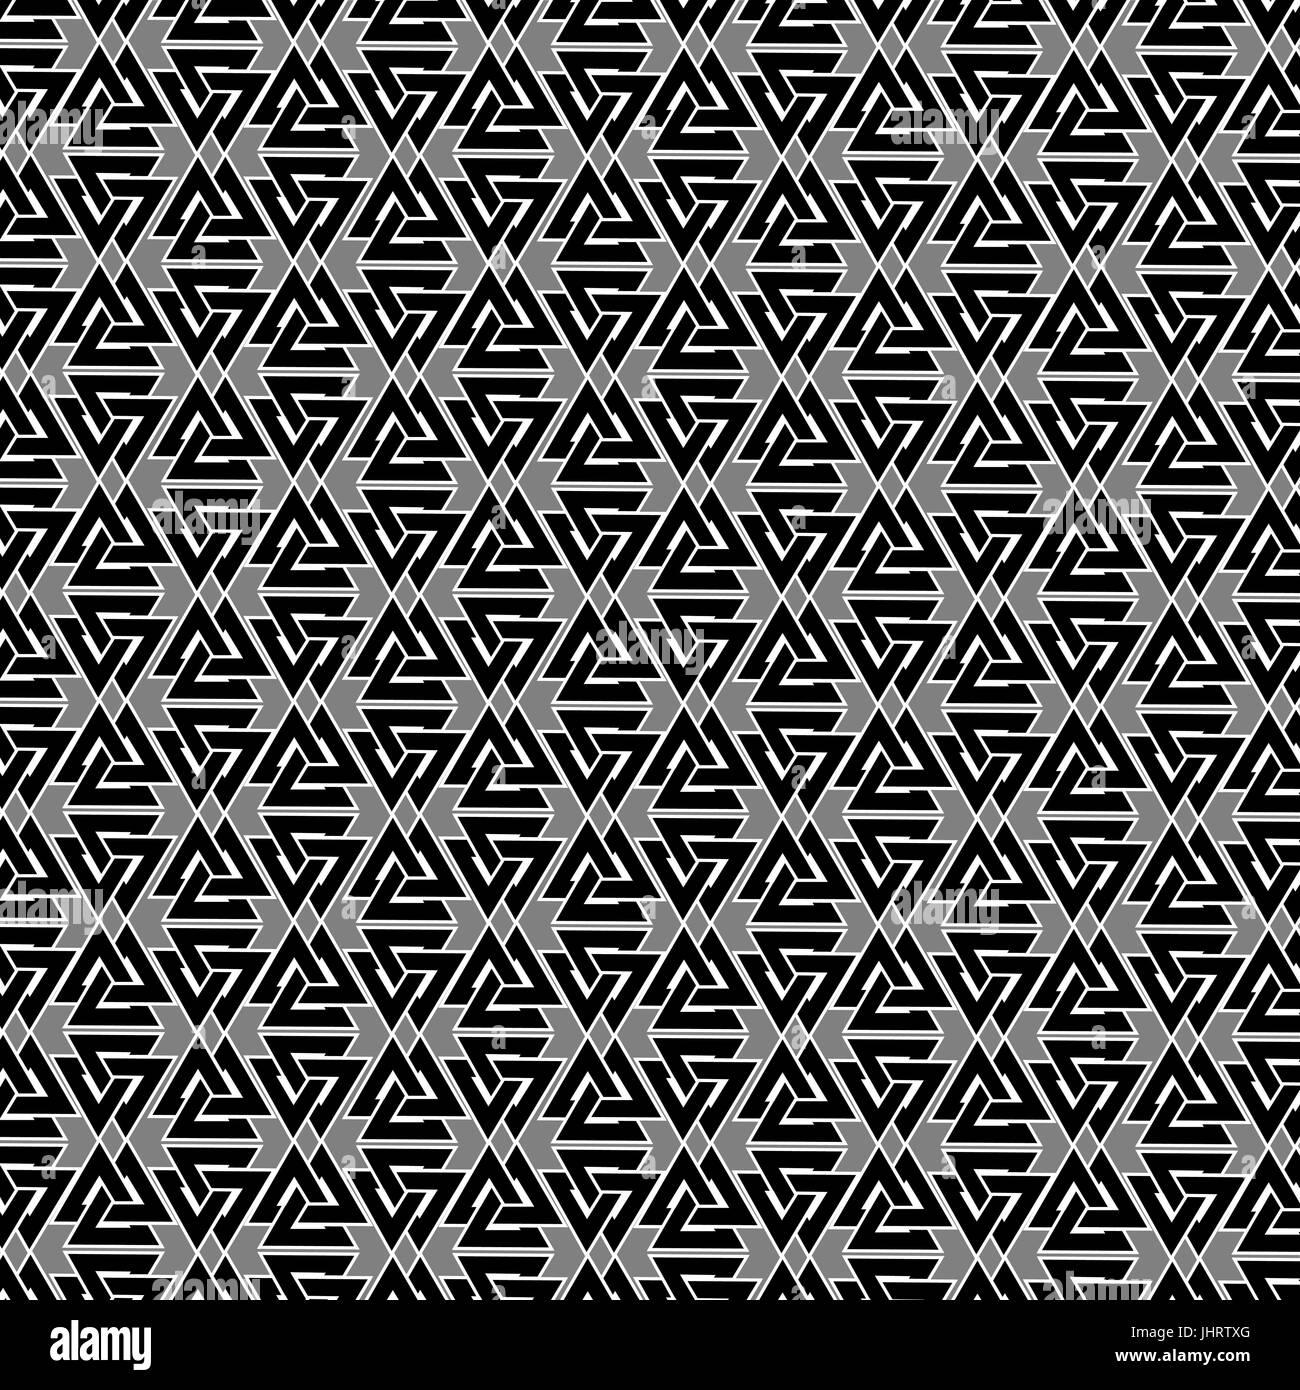 Valknut vector pattern, Valknut black and white background - Stock Vector